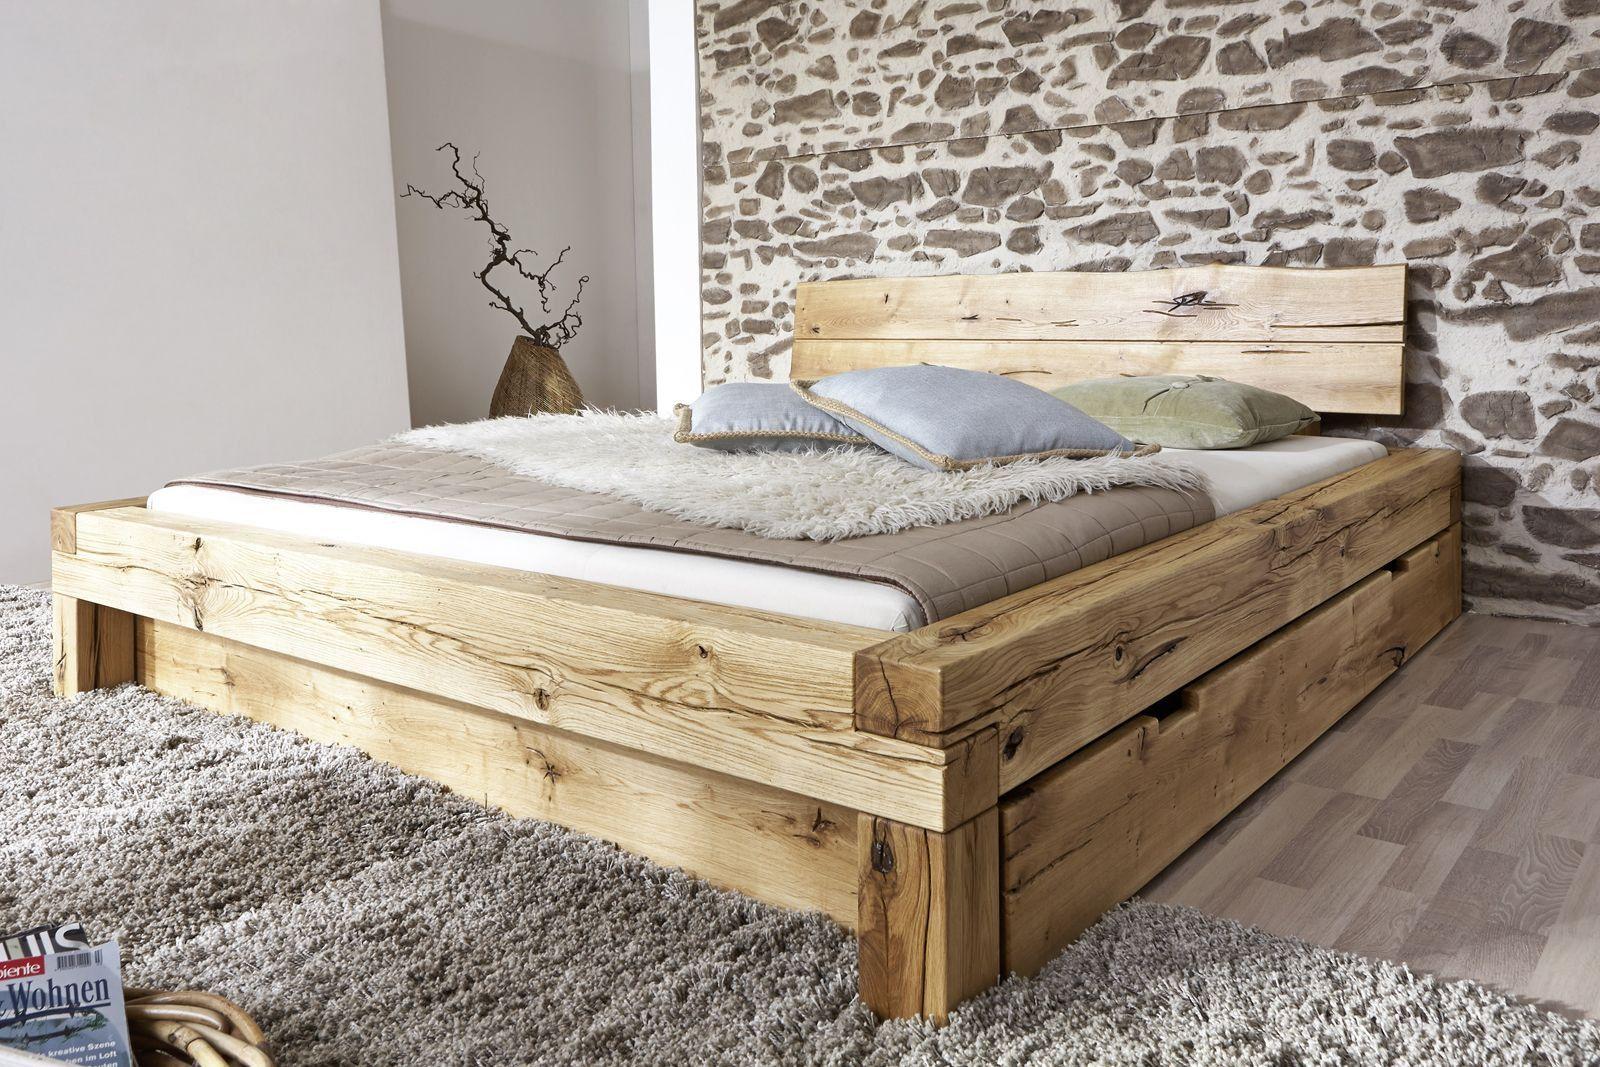 Holzbett 180 200 Elegant Die Besten 25 Holzbett Ideen Auf Pinterest Bett Selber Bauen Holzbalken Bett Bett Bauen